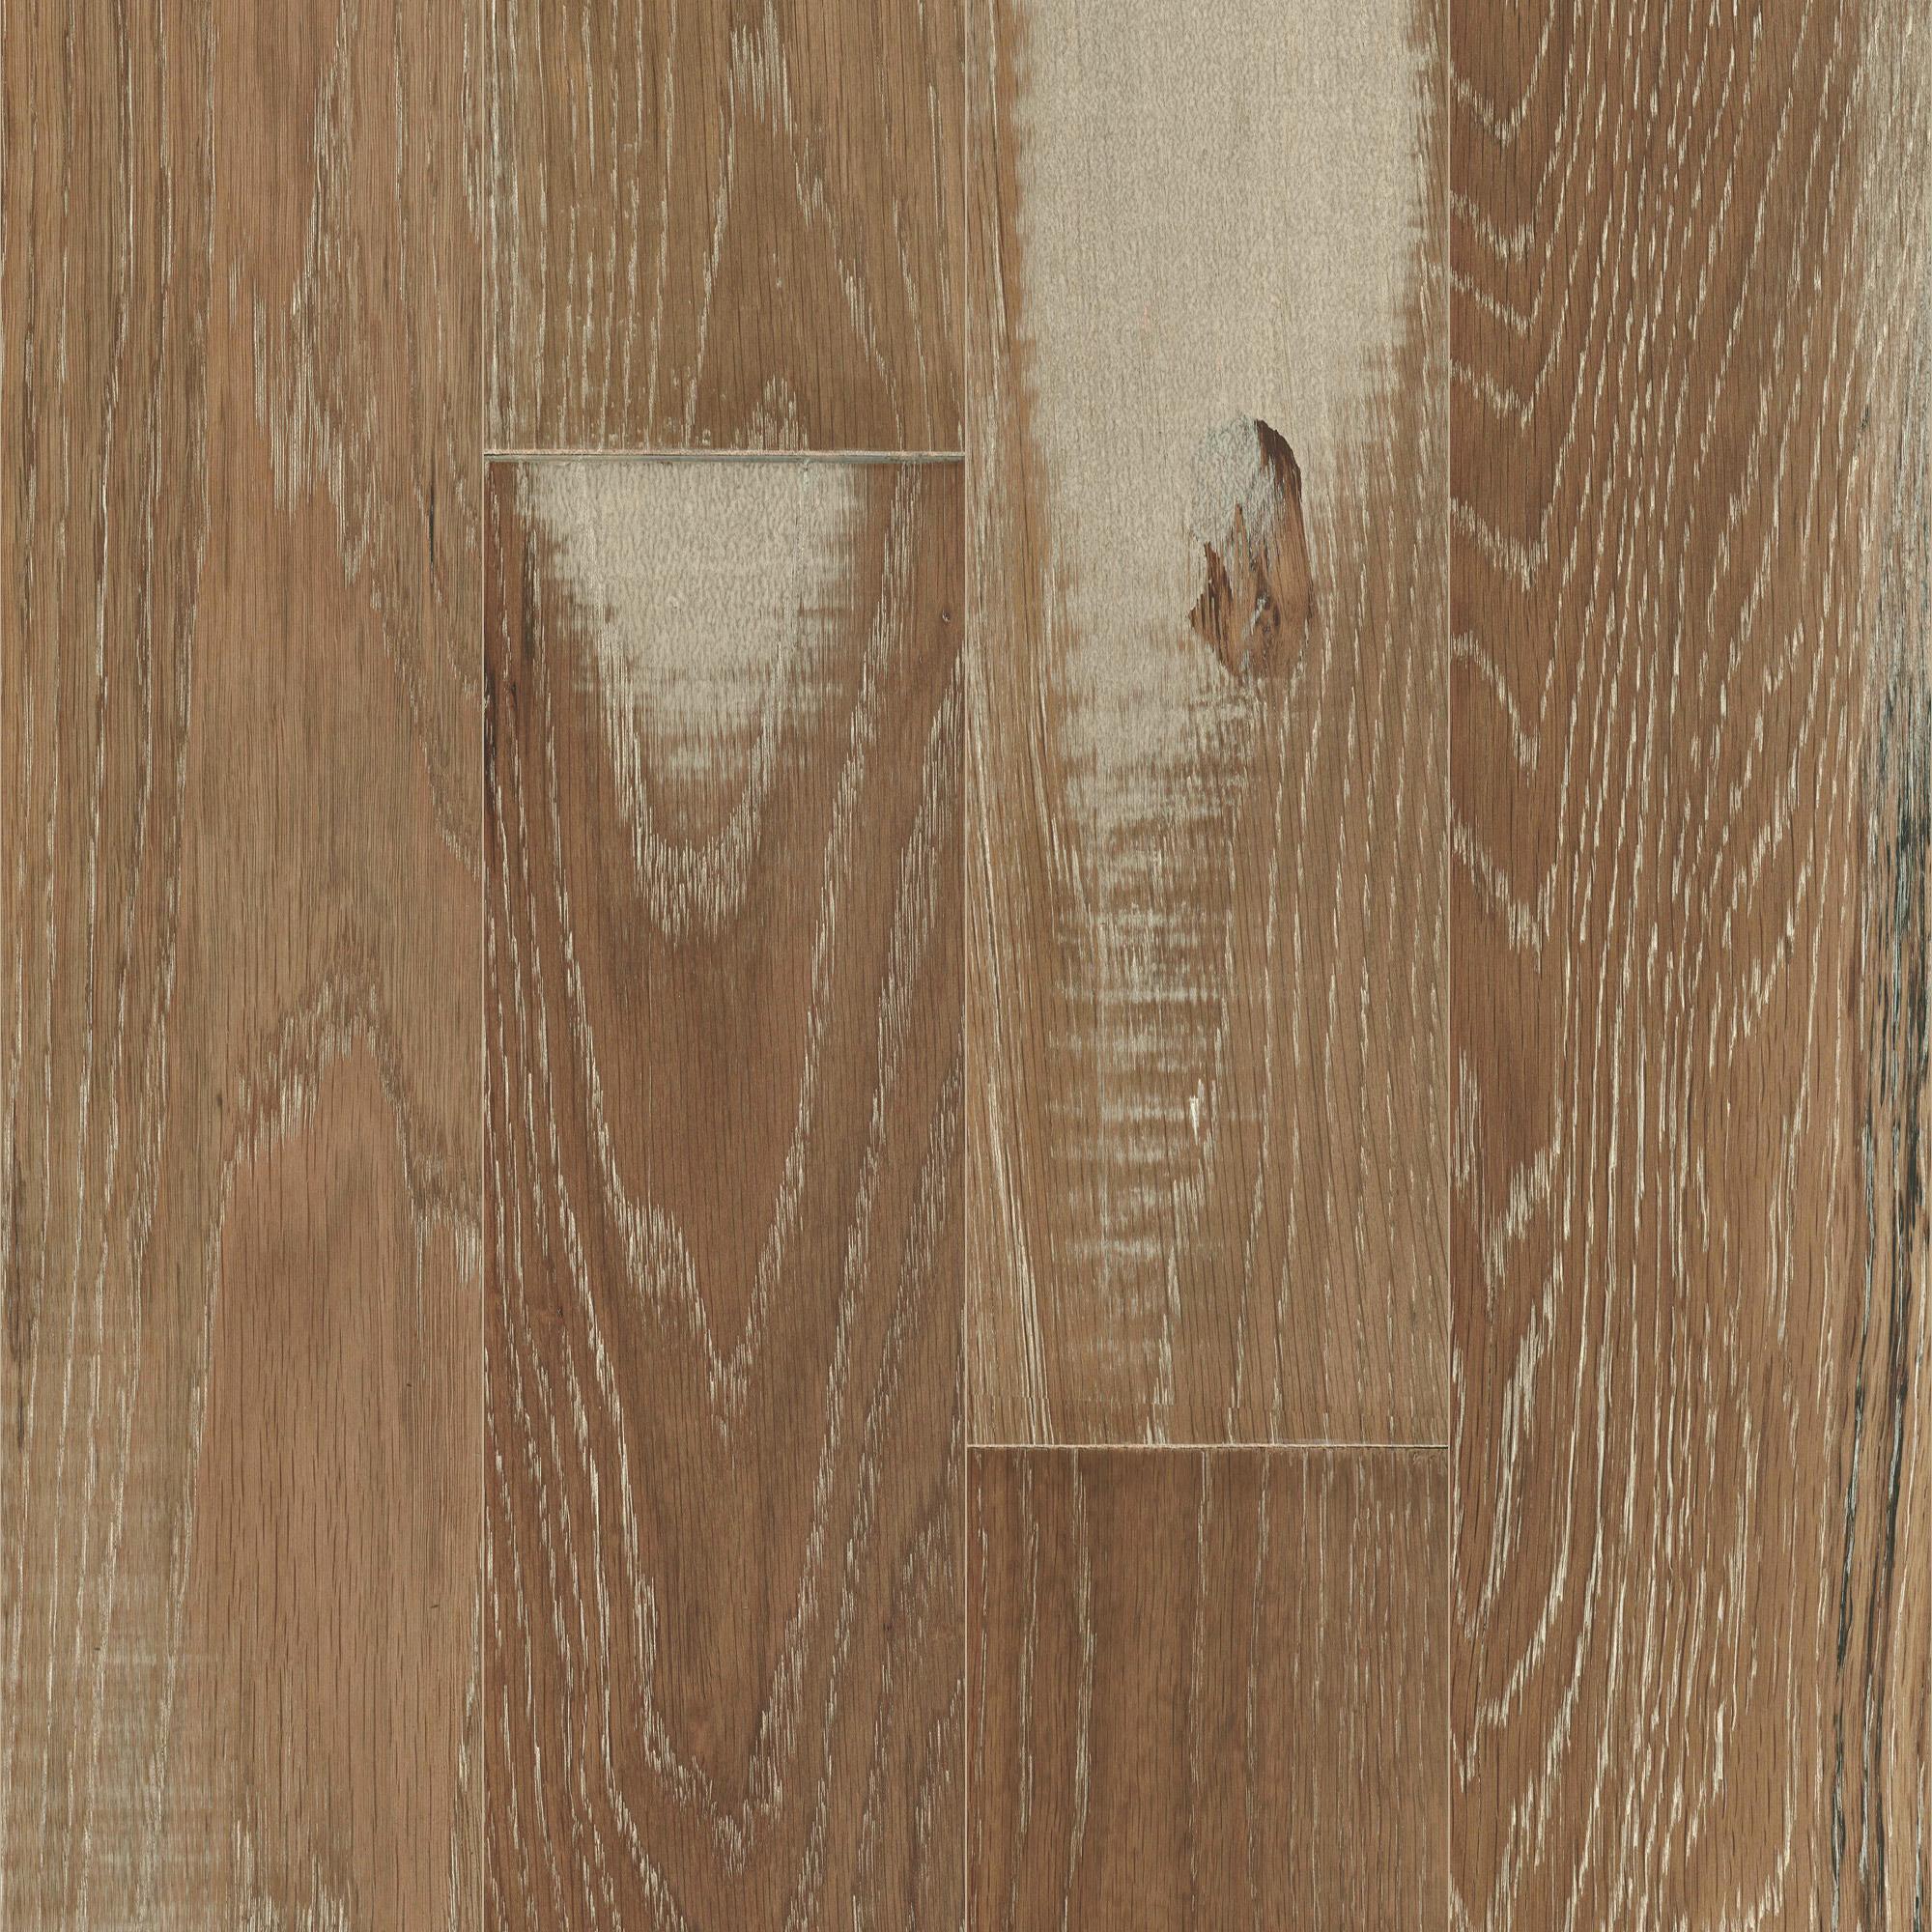 best hand scraped hardwood flooring reviews of mullican castillian oak latte 5 wide solid hardwood flooring pertaining to file 447 8